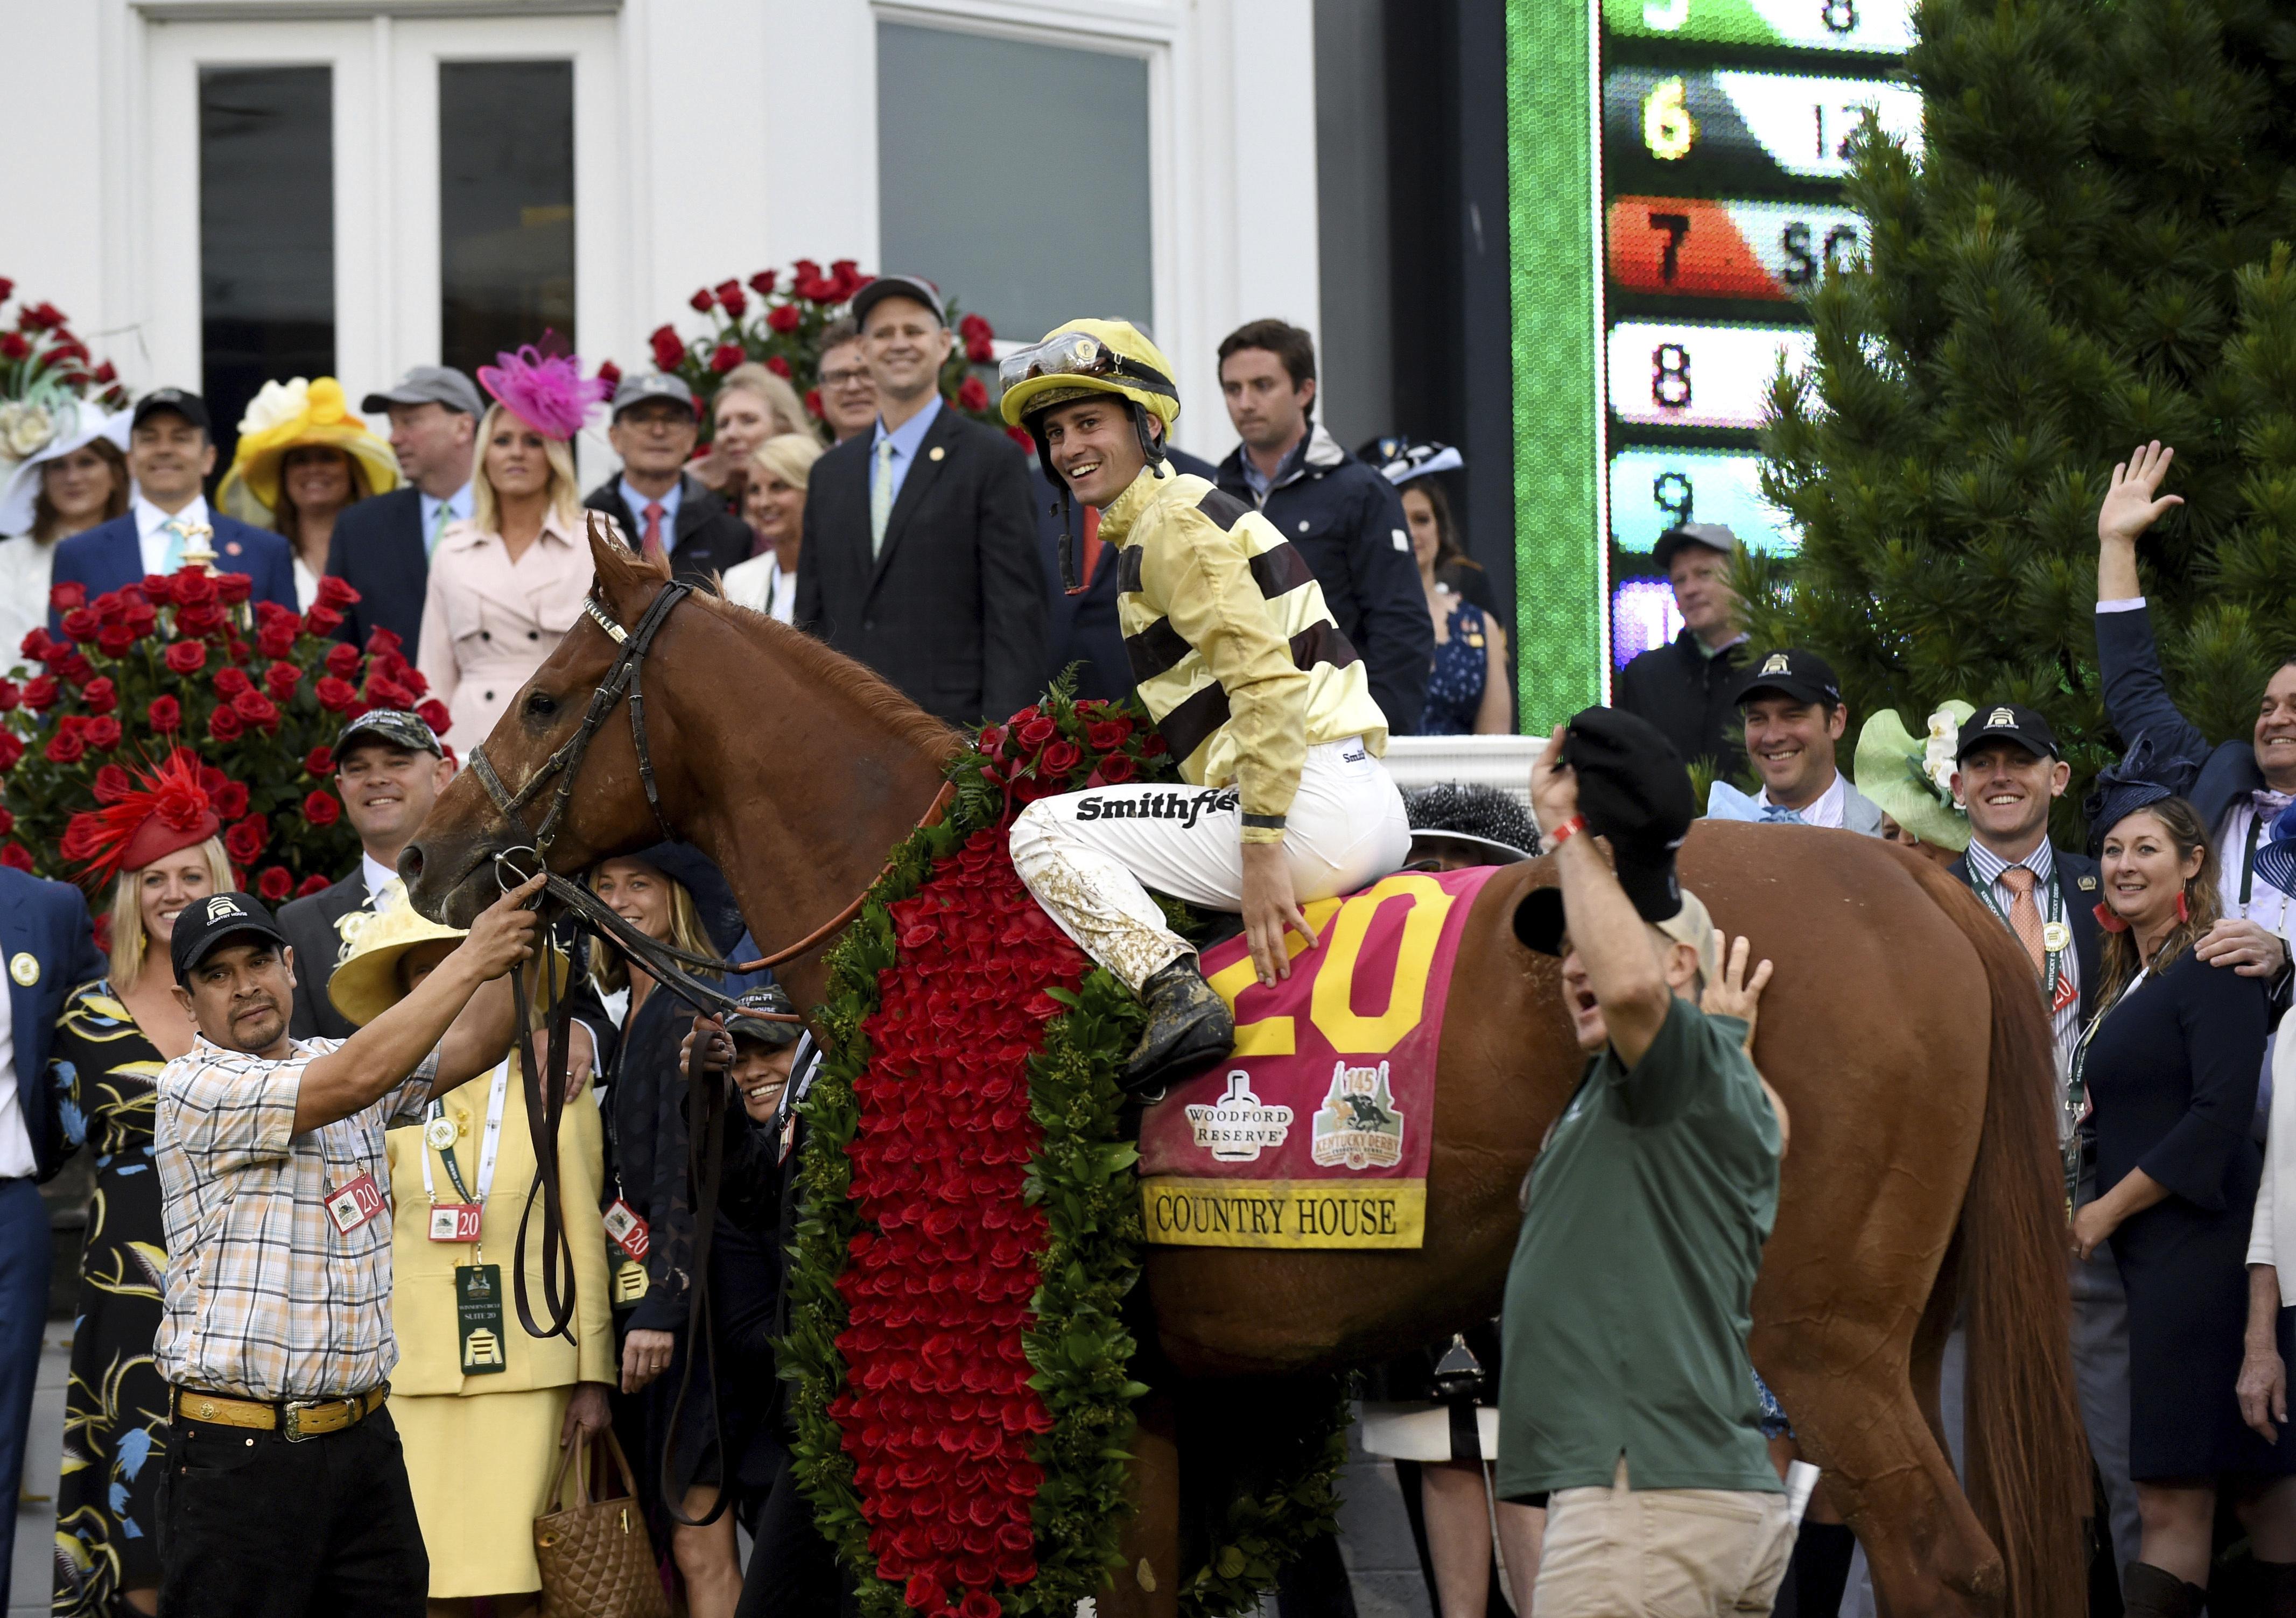 Jockey Flavien Prat celebra el primer lugar. (Photo by Diane Bondareff/Invision for Longines/AP Images)